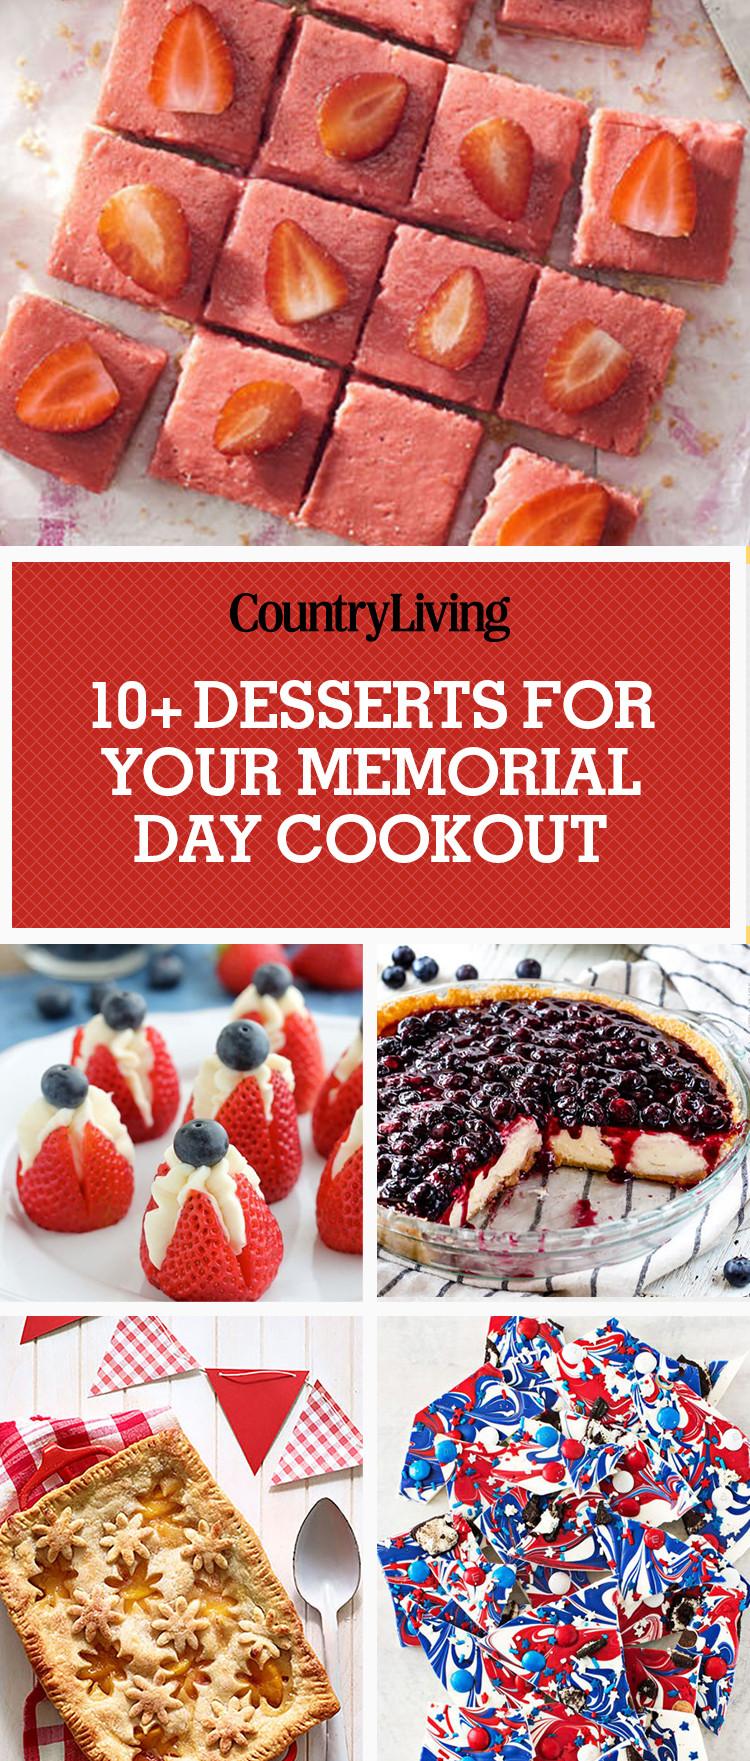 Dessert For Memorial Day  13 Easy Memorial Day Desserts Best Recipes for Memorial